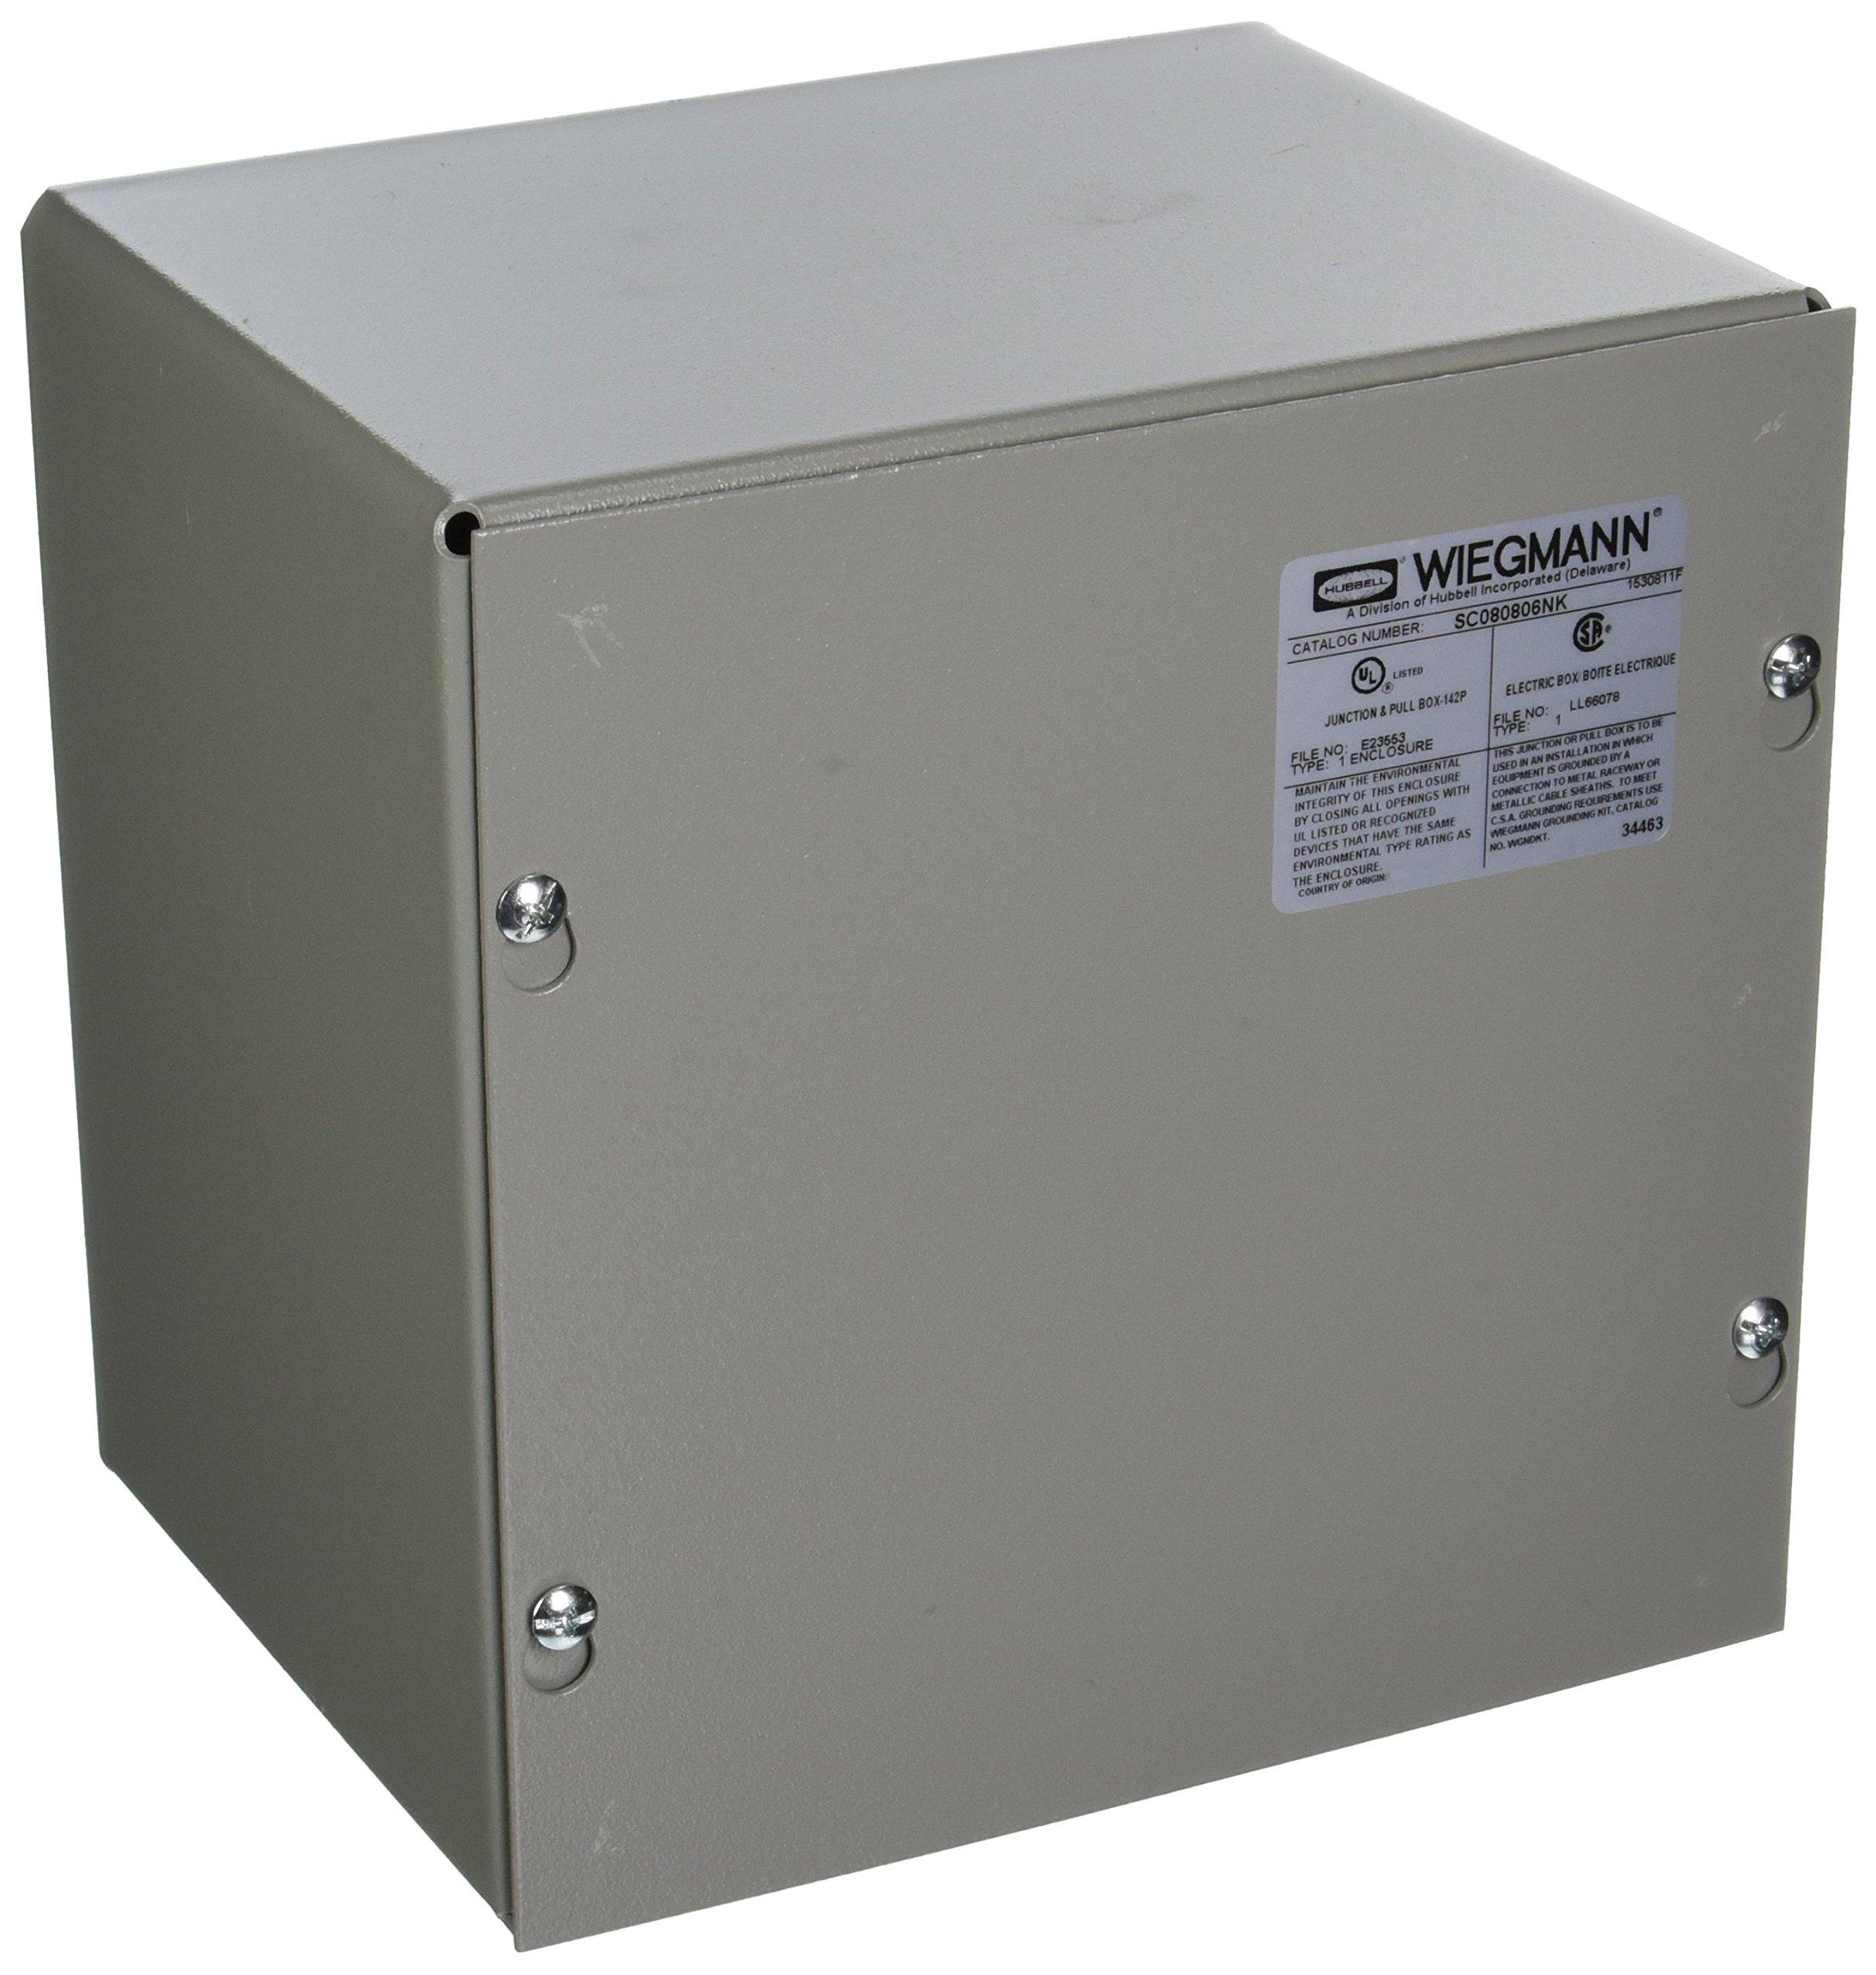 Wiegmann SC080806NK SC-Series NEMA 1 Screw Cover Wallmount Pull Box, No Knockouts, Painted Steel, 8'' x 8'' x 6''